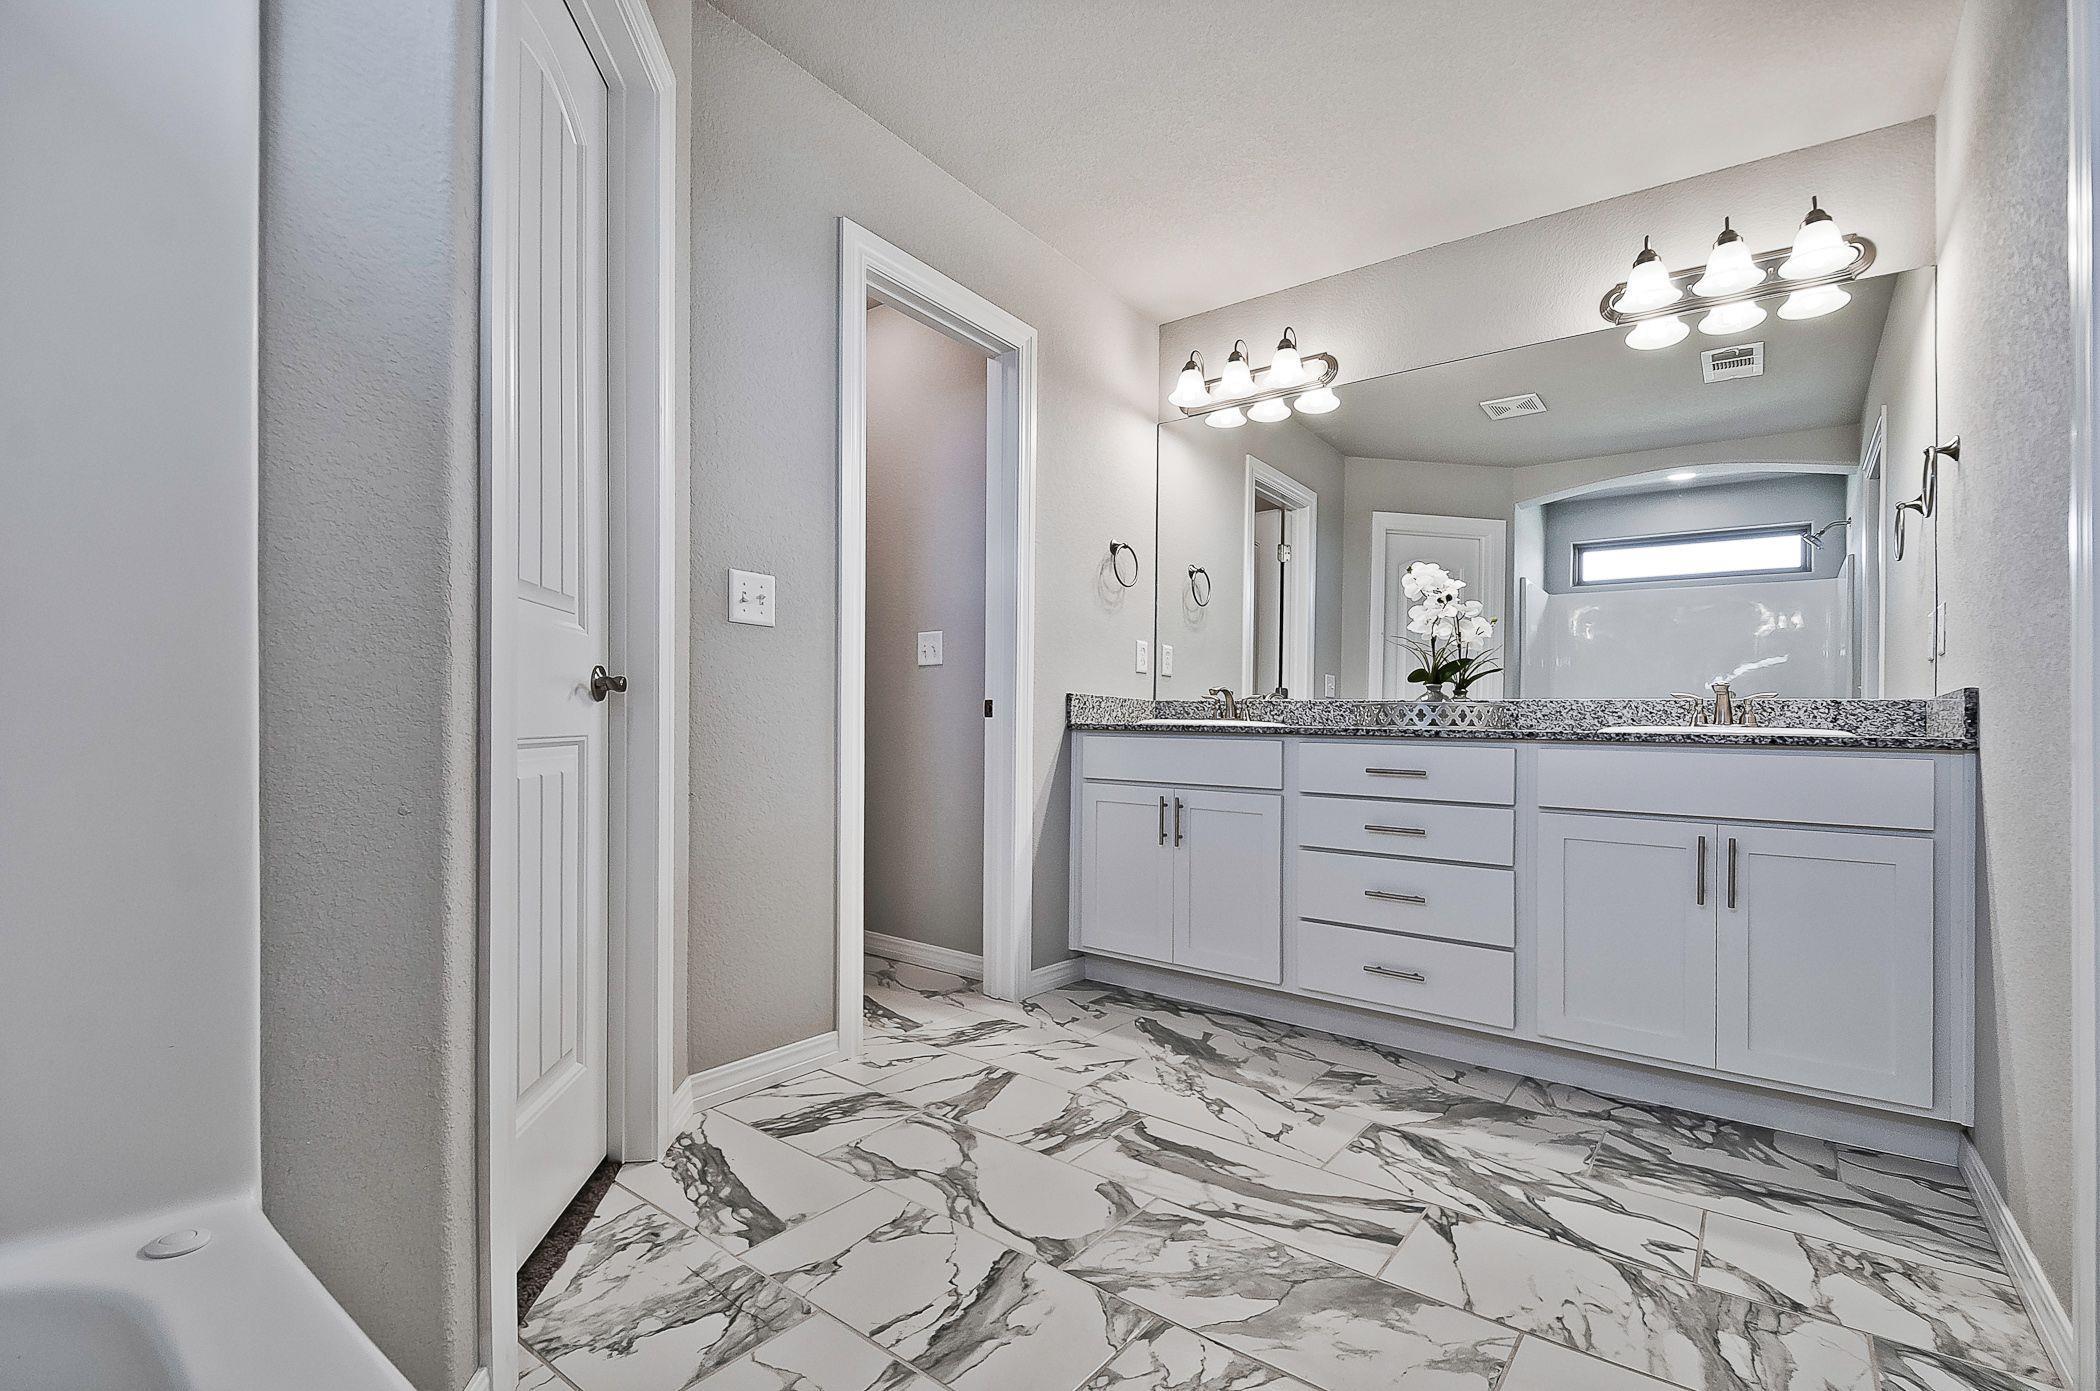 Bathroom featured in the Oak 1463 By Riverwood Homes - Arkansas in Fayetteville, AR